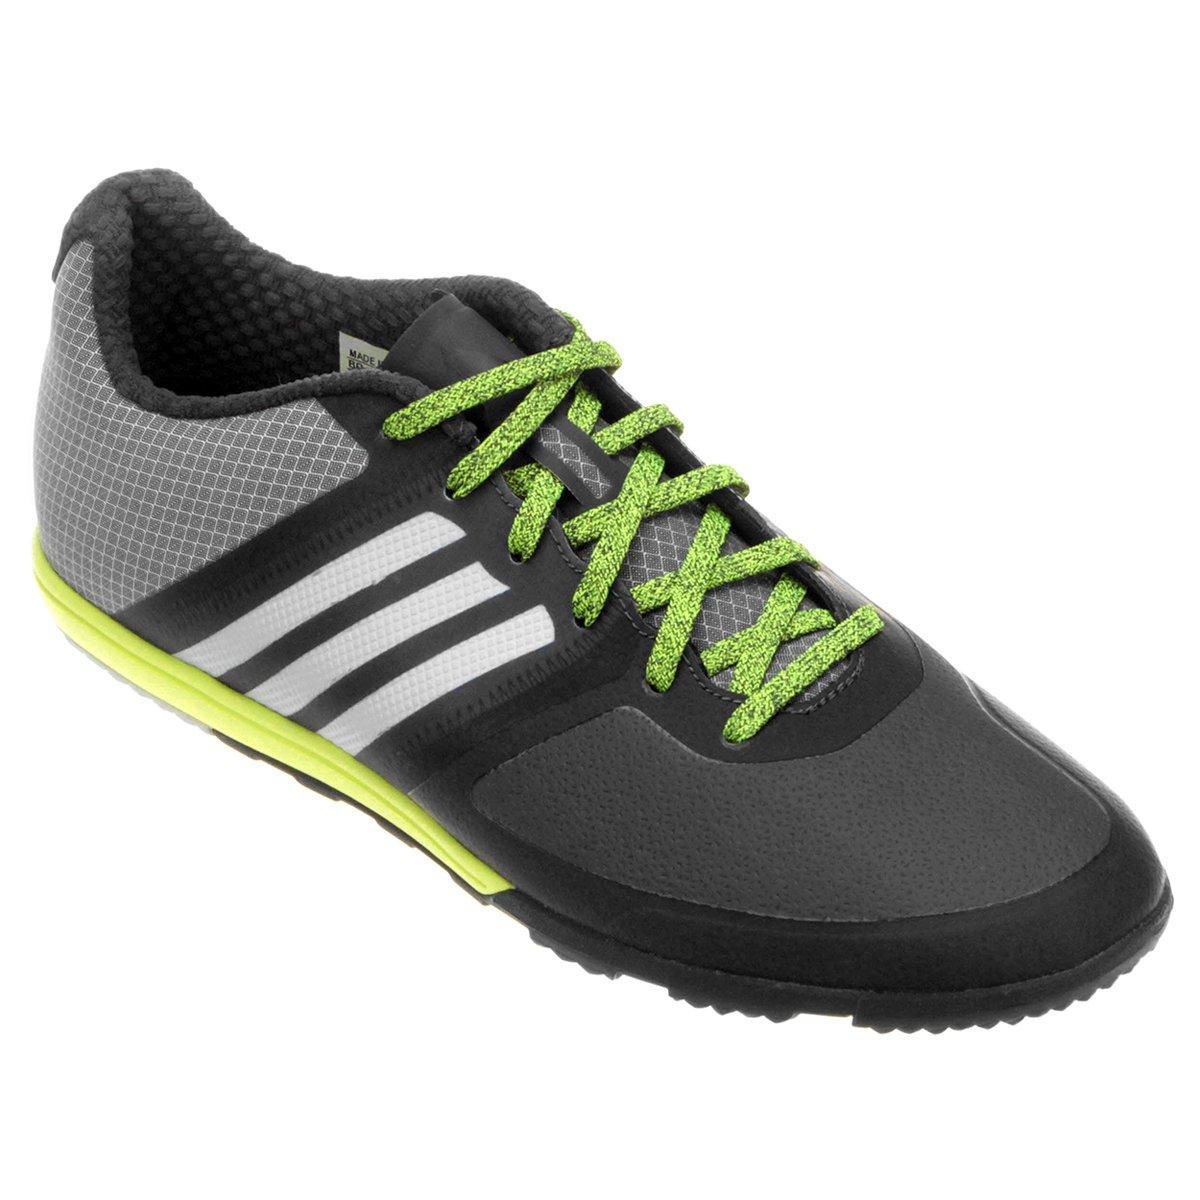 Chuteira Society Adidas Vs Ace 15.2 Cage Masculina - Compre Agora ... 69dd1fc8d2953